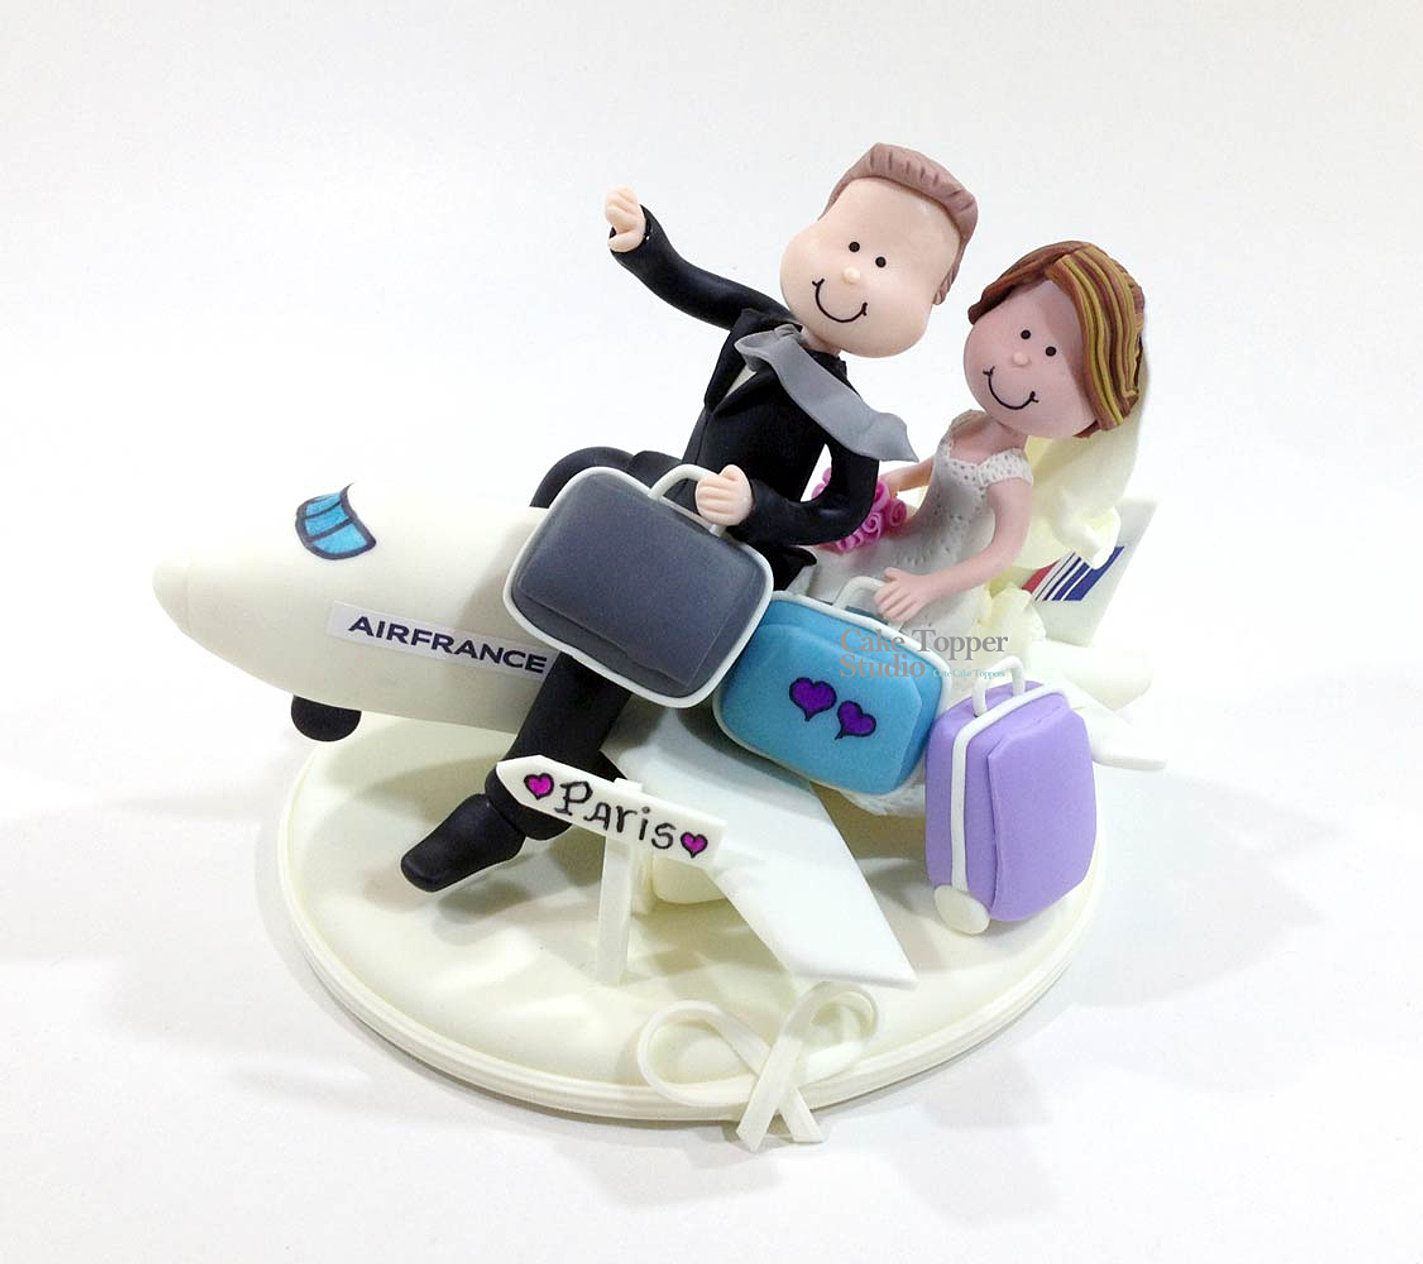 Bride Groom Airplane Cake Topper